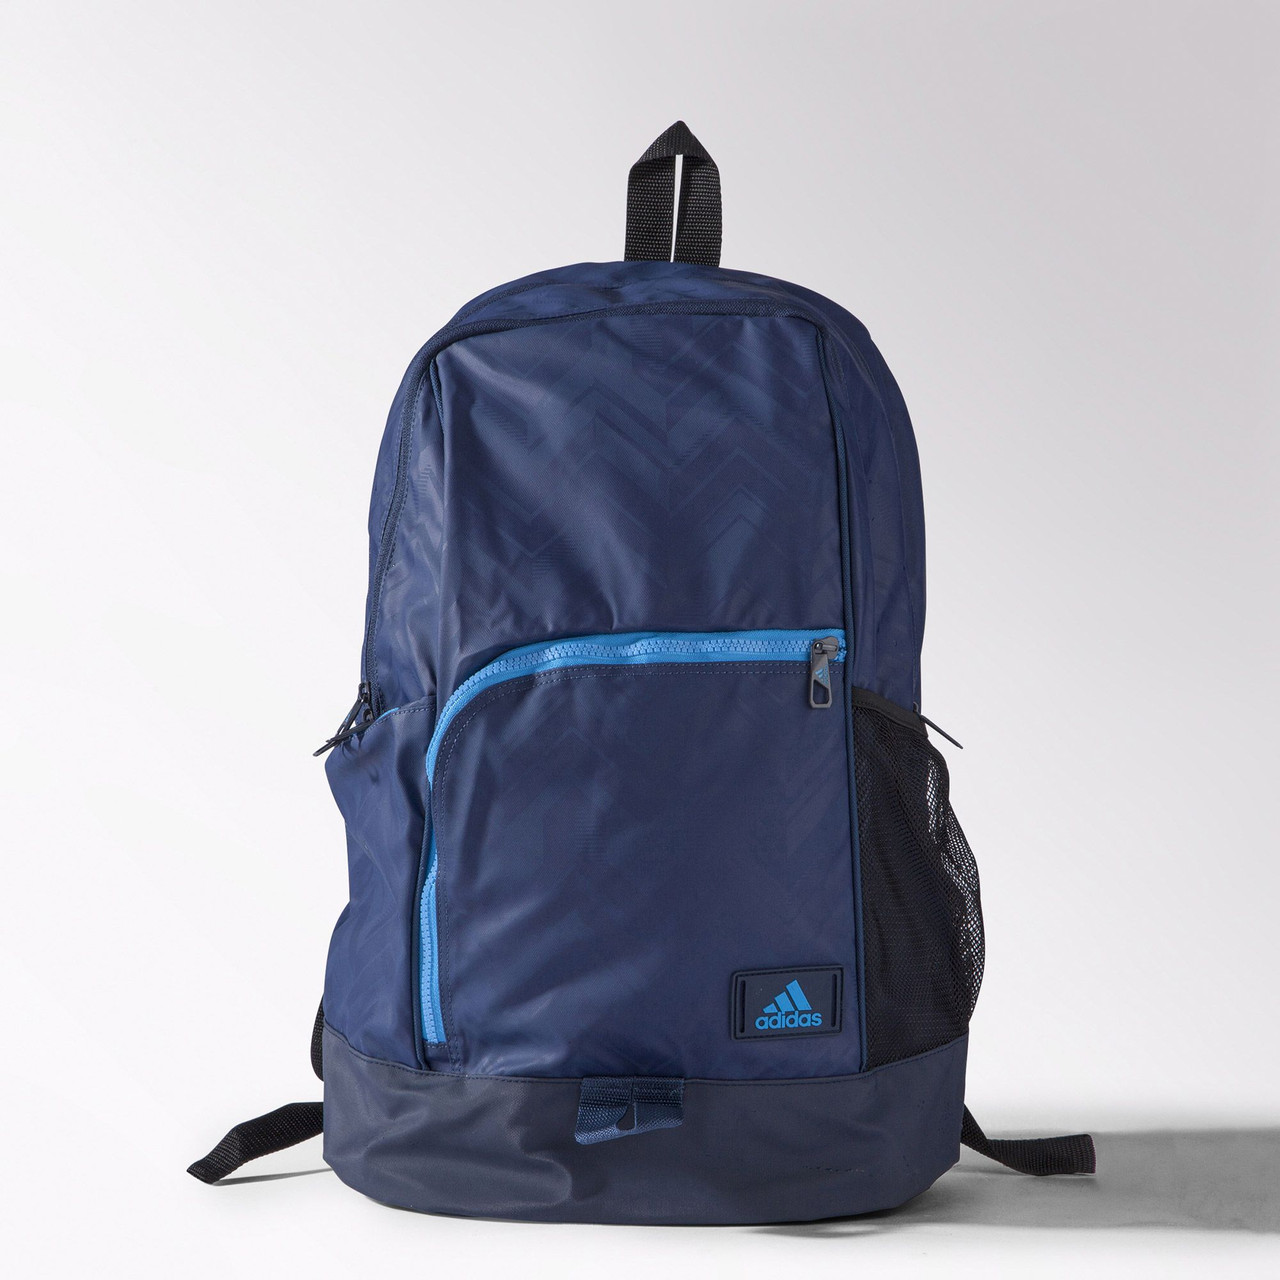 Рюкзак adidas NGA 1.0 Backpack M67267 адидас